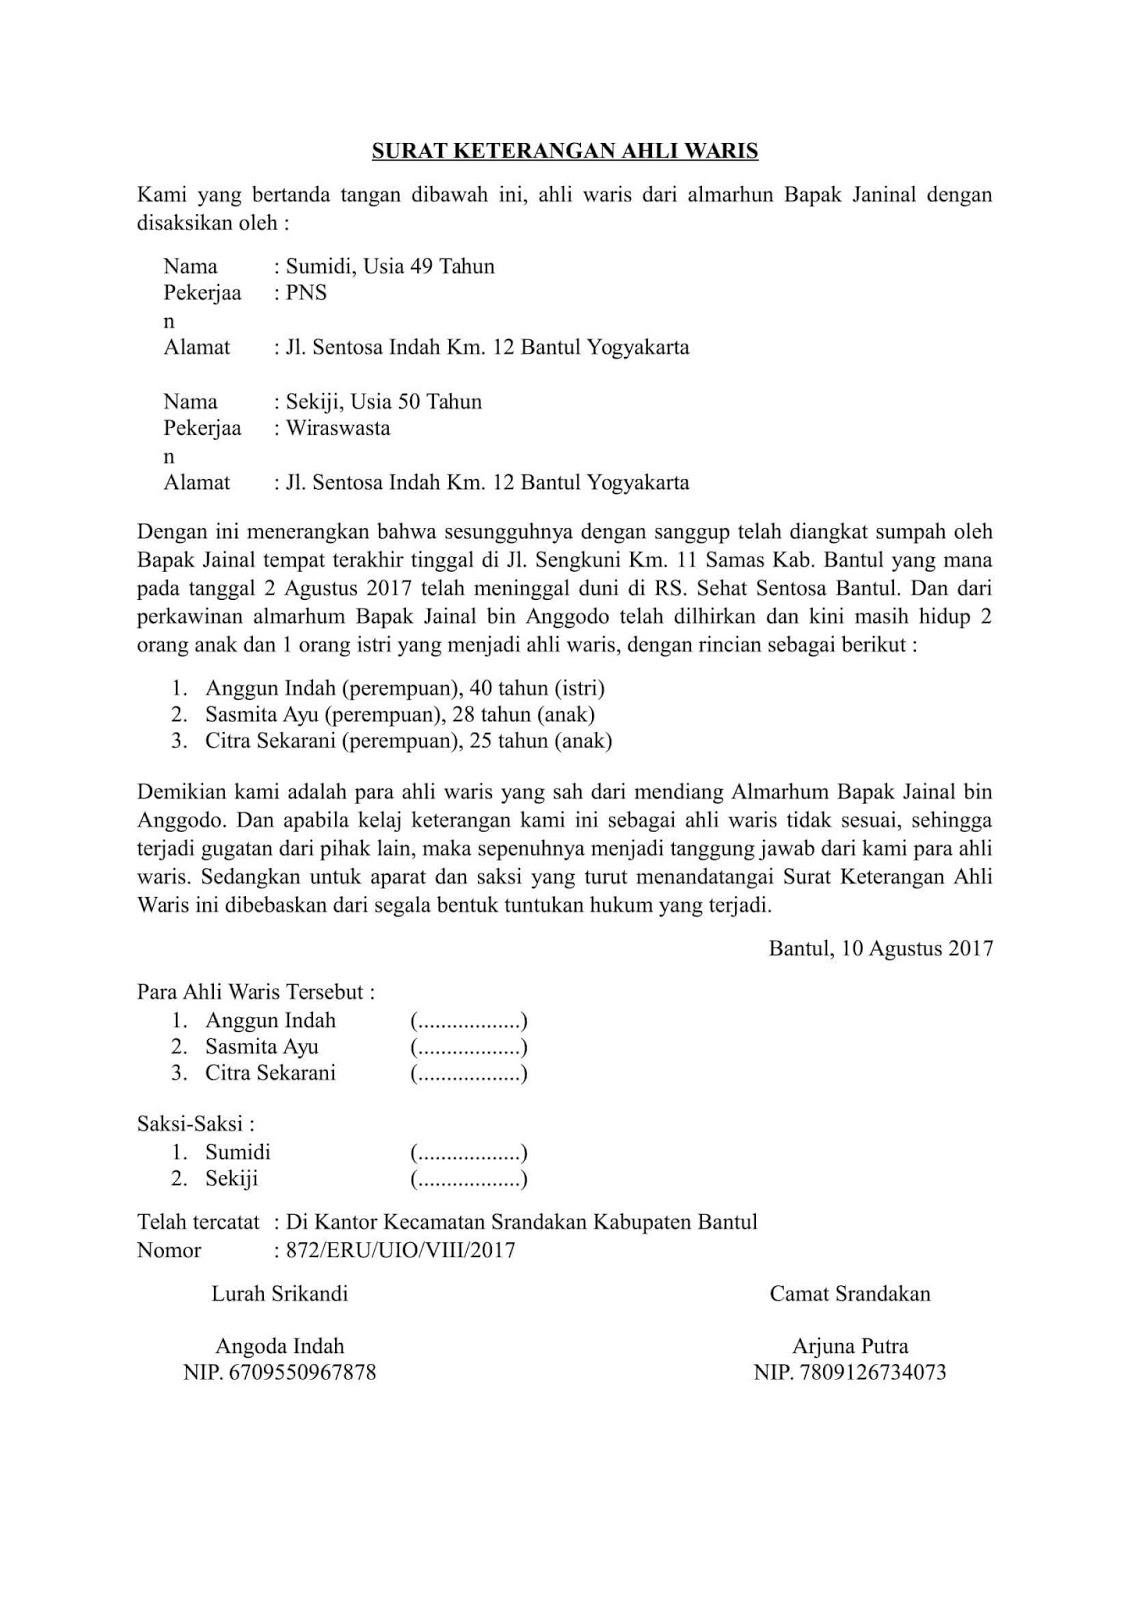 Contoh Surat Ahli Waris Terlengkap